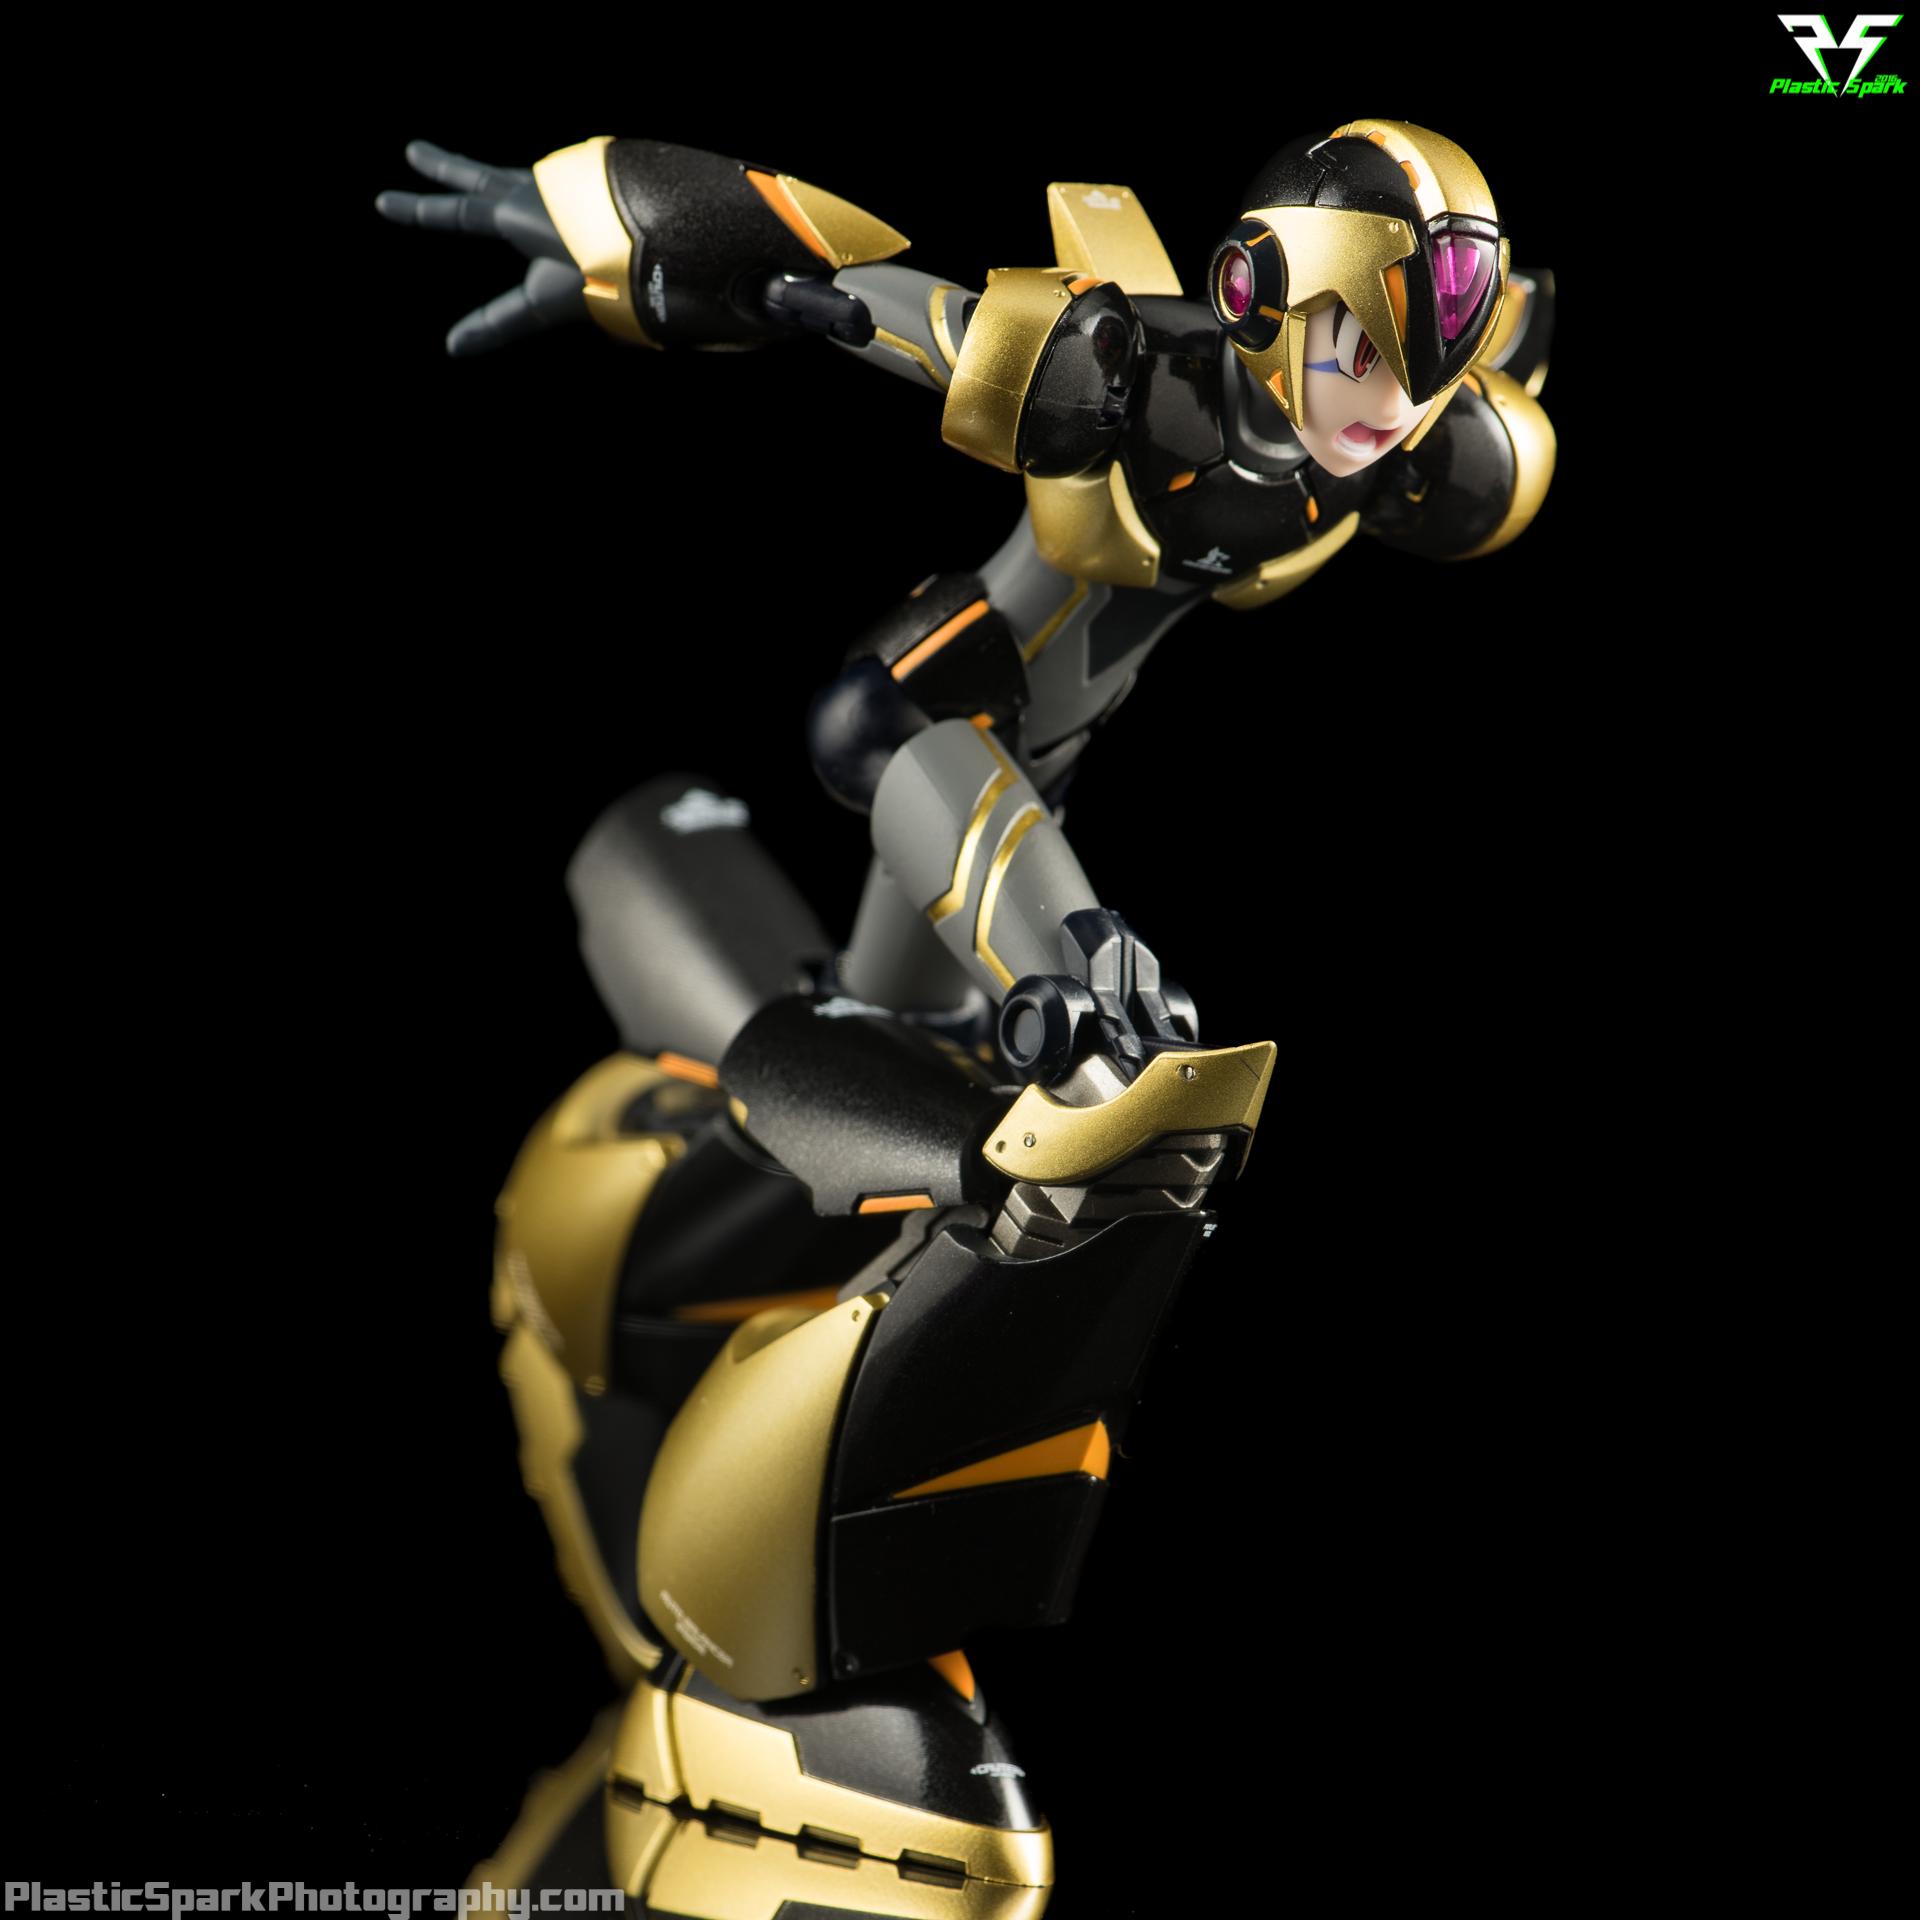 Truforce-Megaman-X-Kai-(9-of-12).png